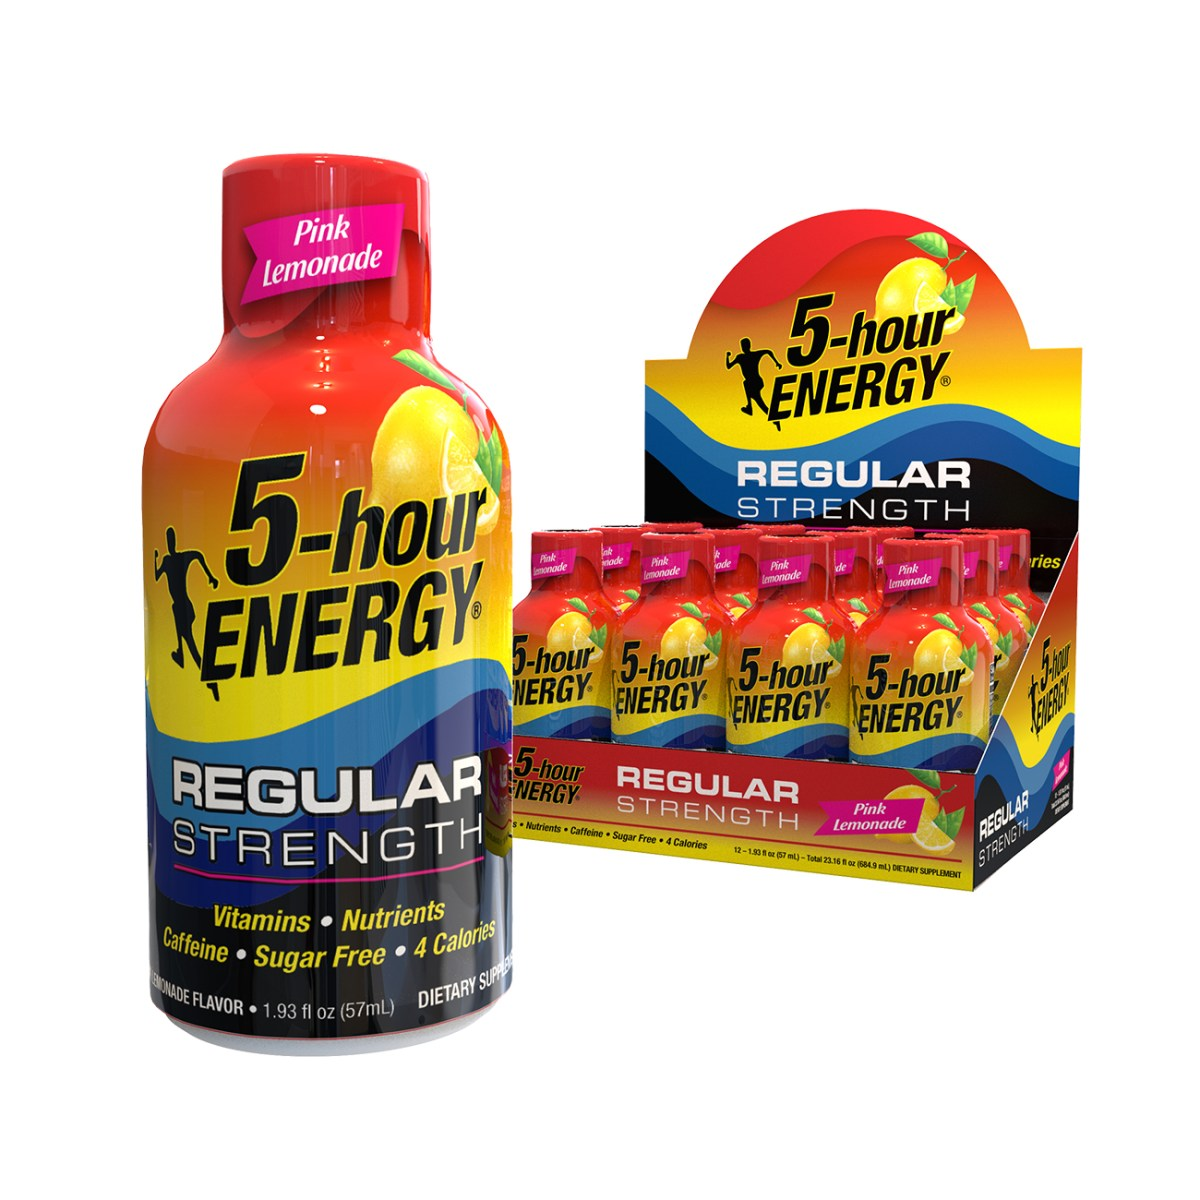 Pink Lemonade flavor Regular Strength 5-hour ENERGY® Shots